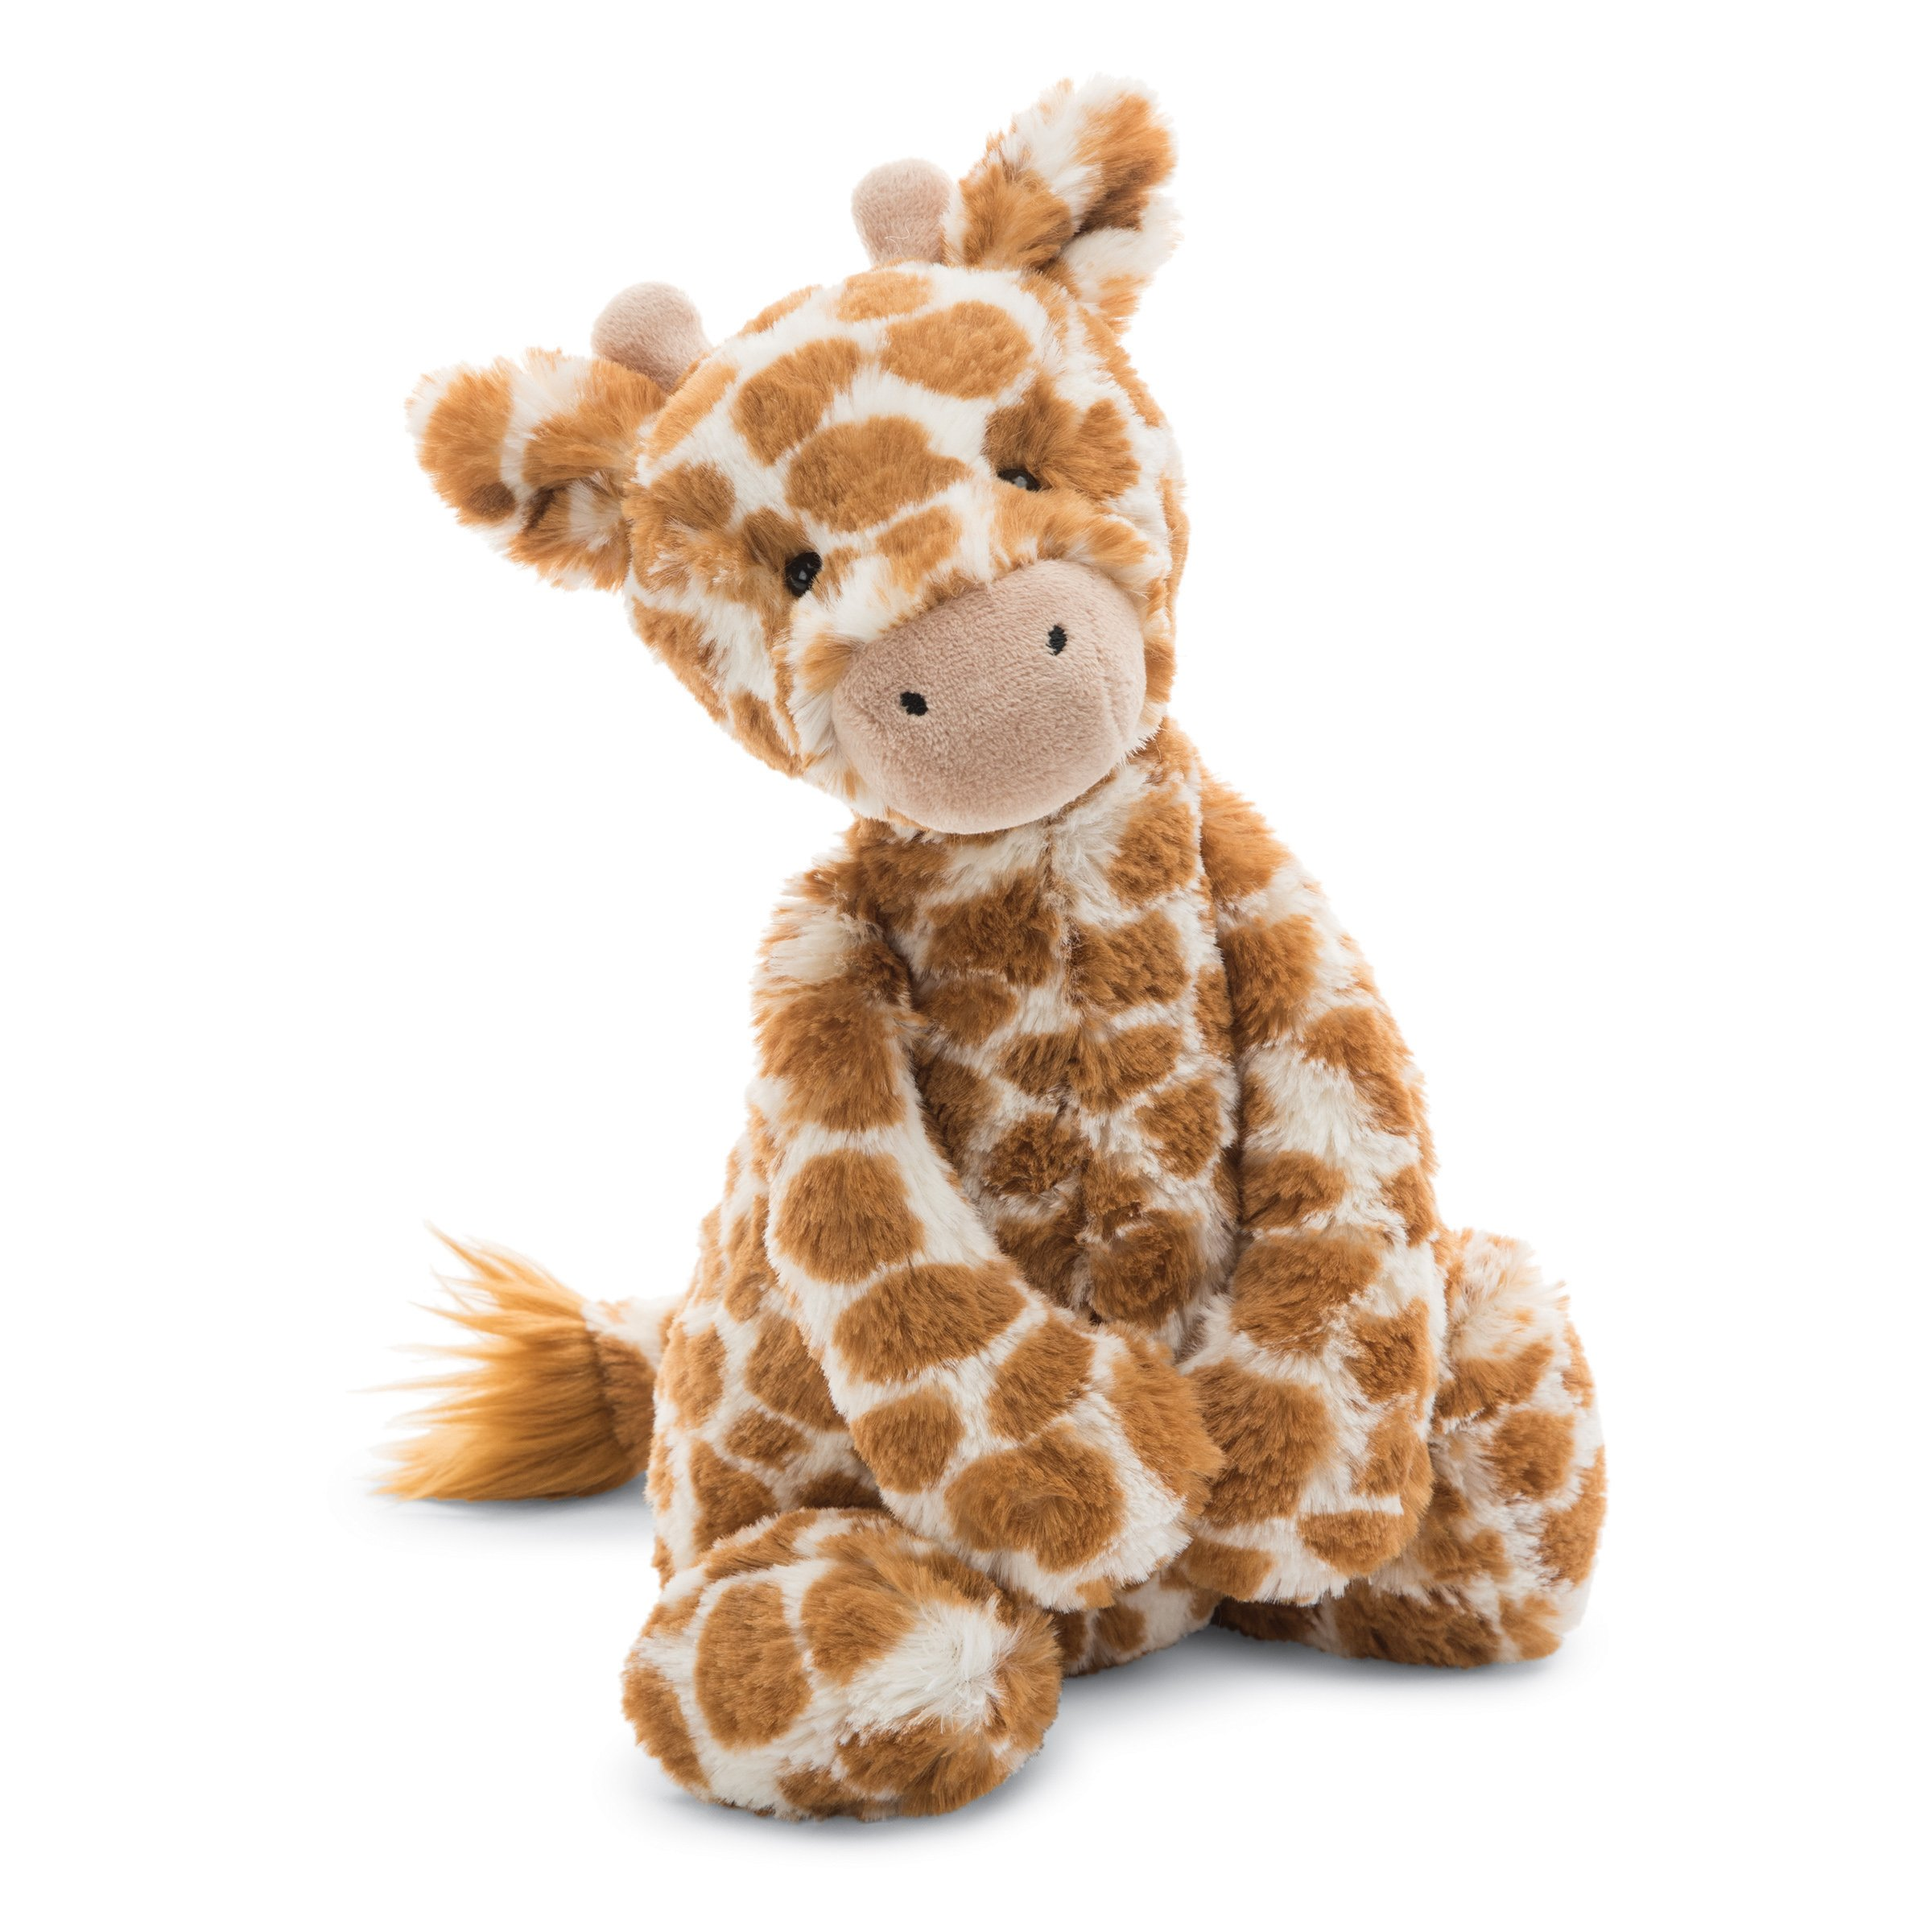 Jellycat Bashful Giraffe Stuffed Animal, Medium, 12 inches